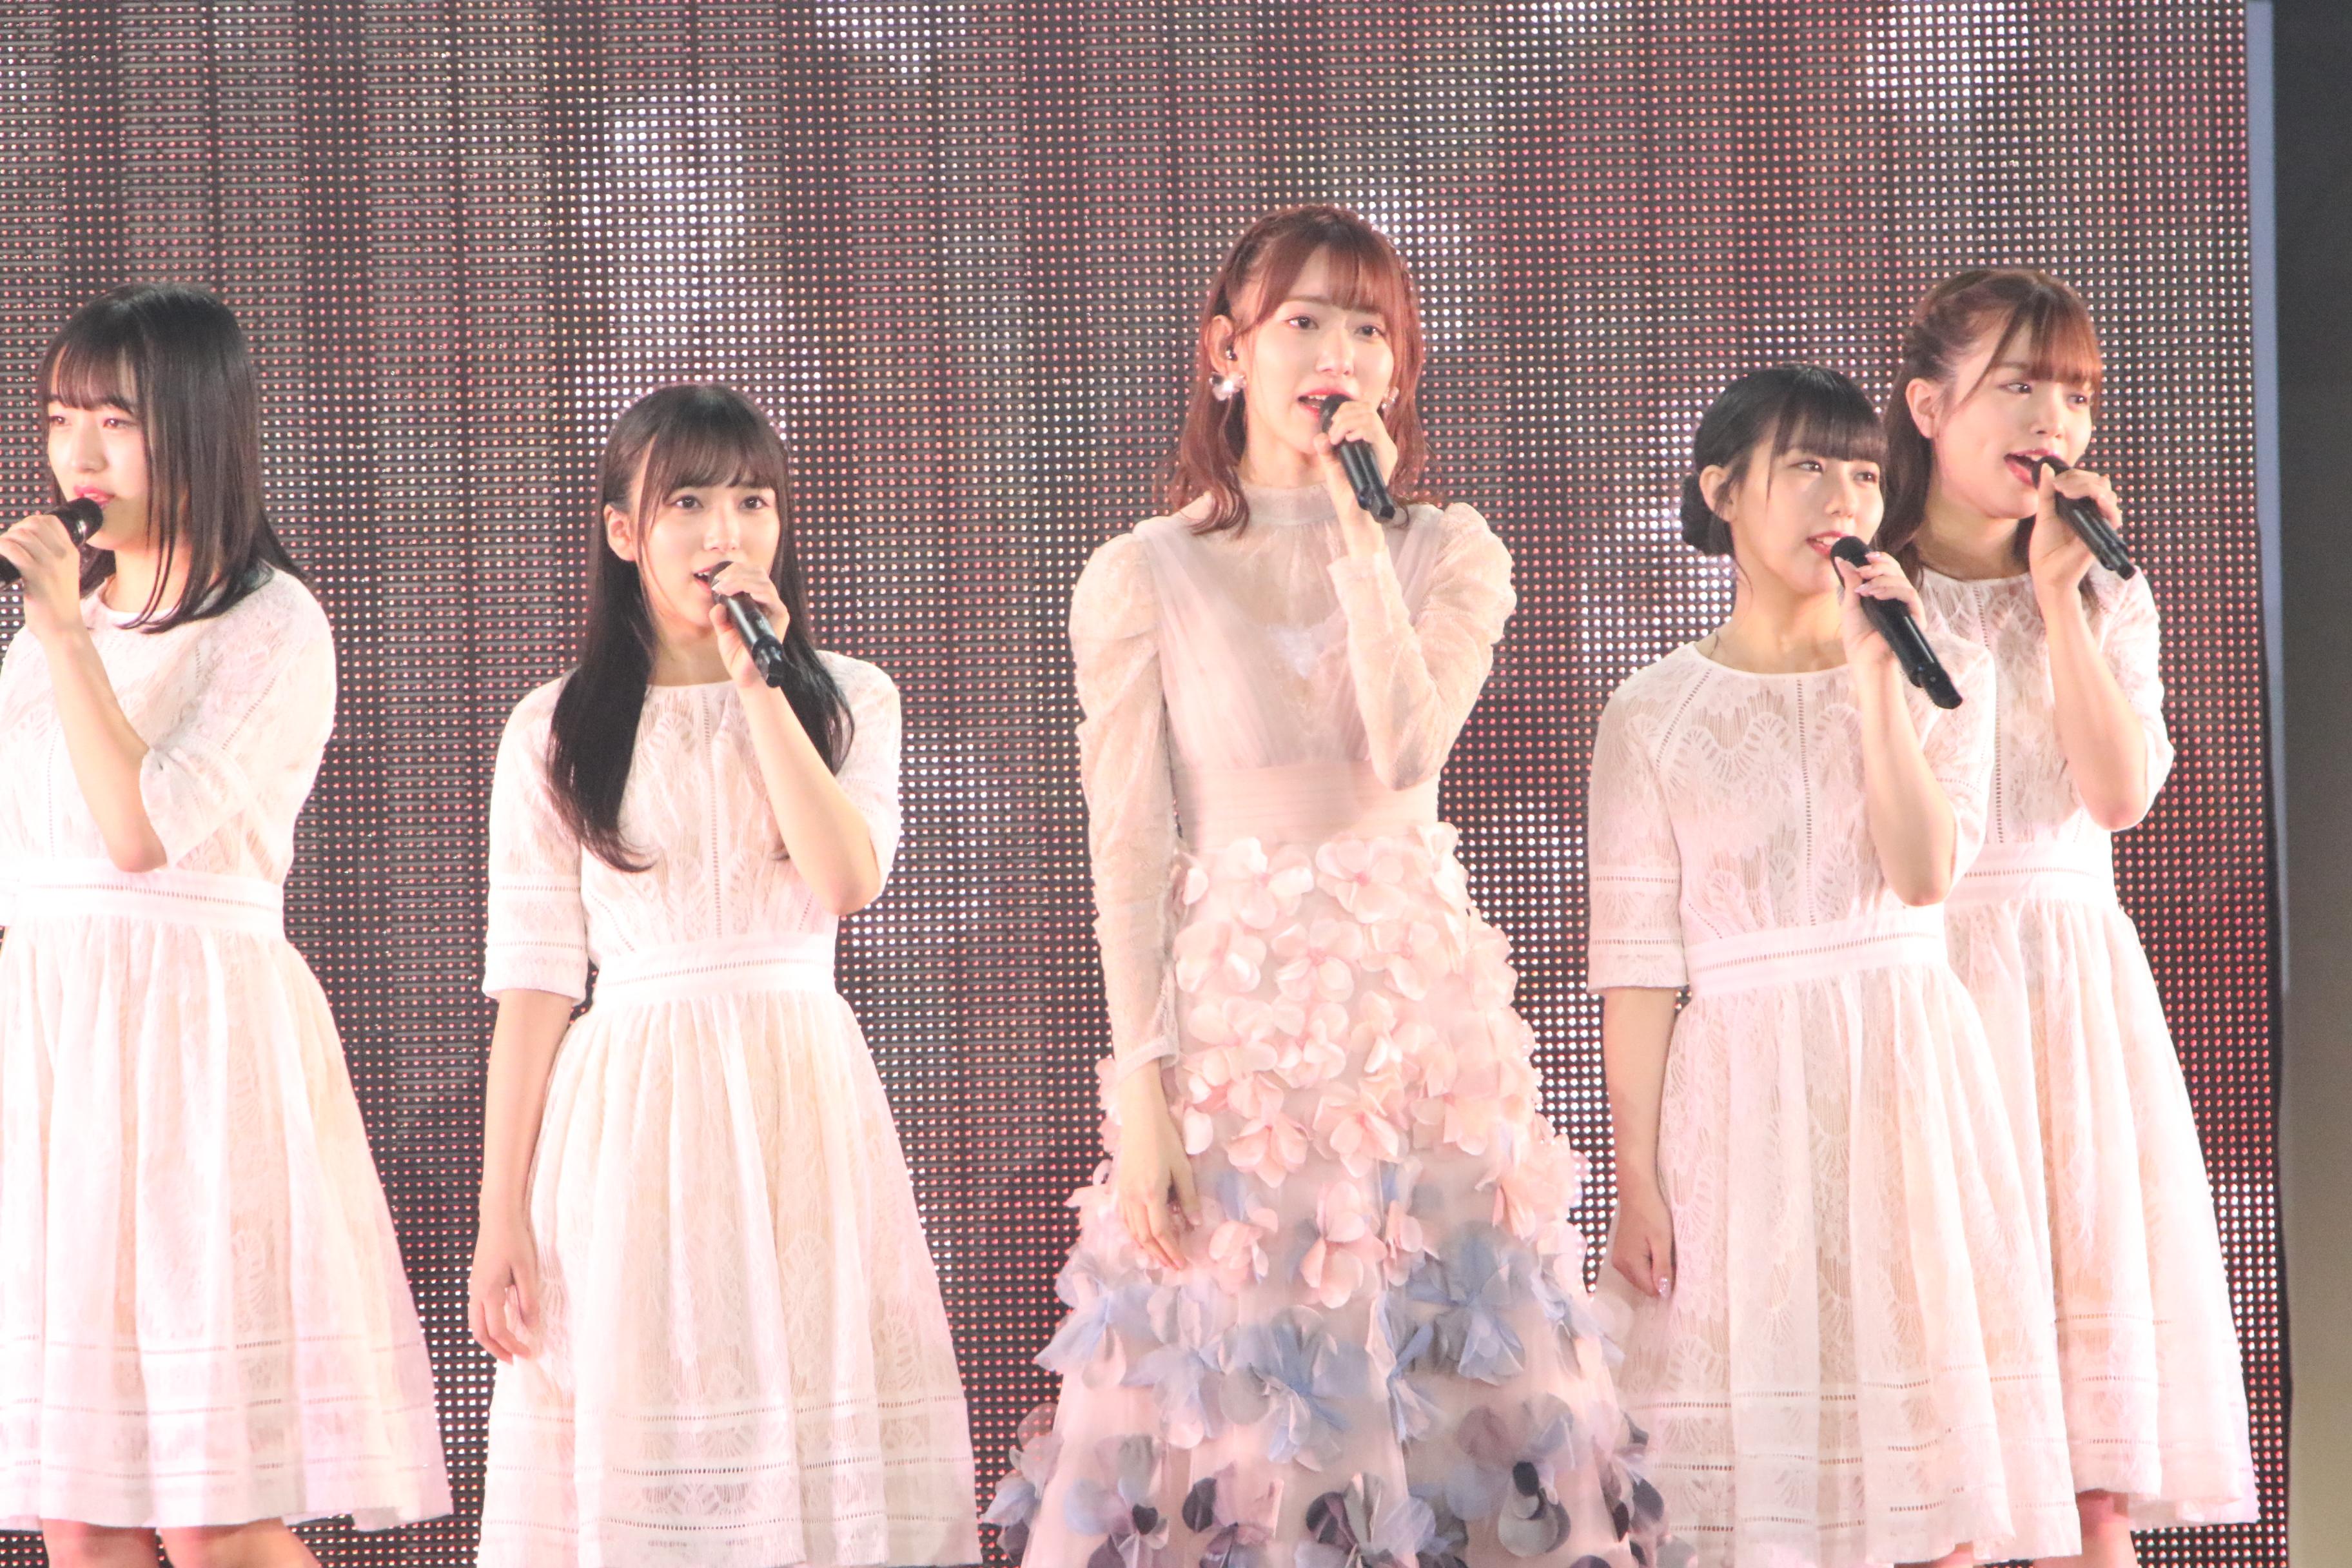 「R.S.に捧ぐ」を熱唱する宮脇咲良とHKT48メンバー